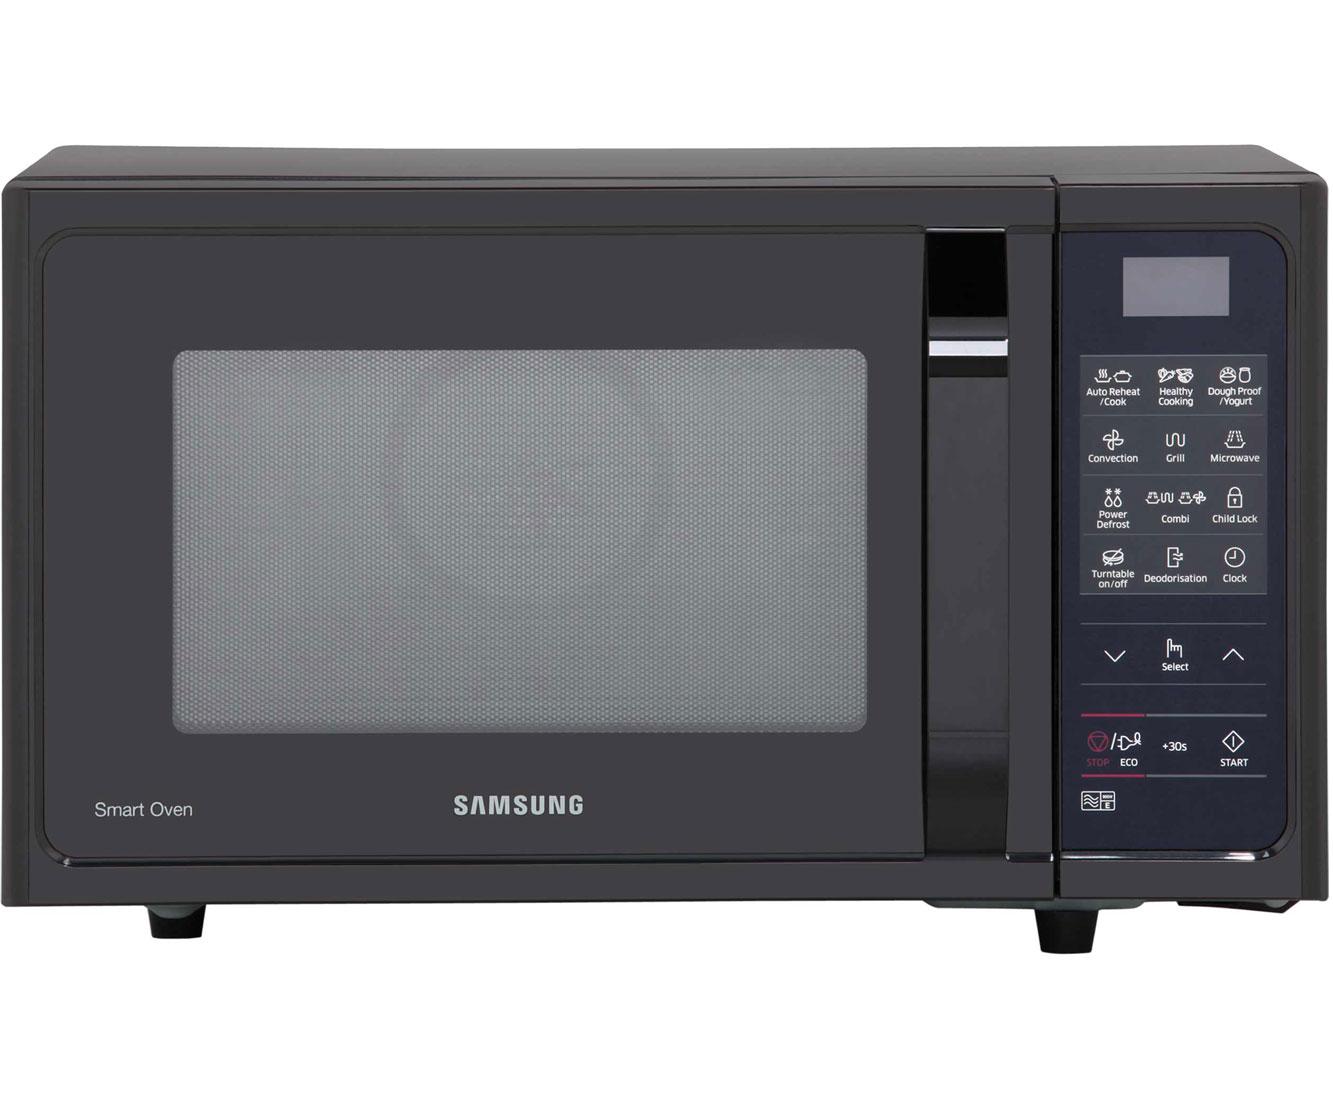 Samsung Microwave Smart Oven Bestmicrowave